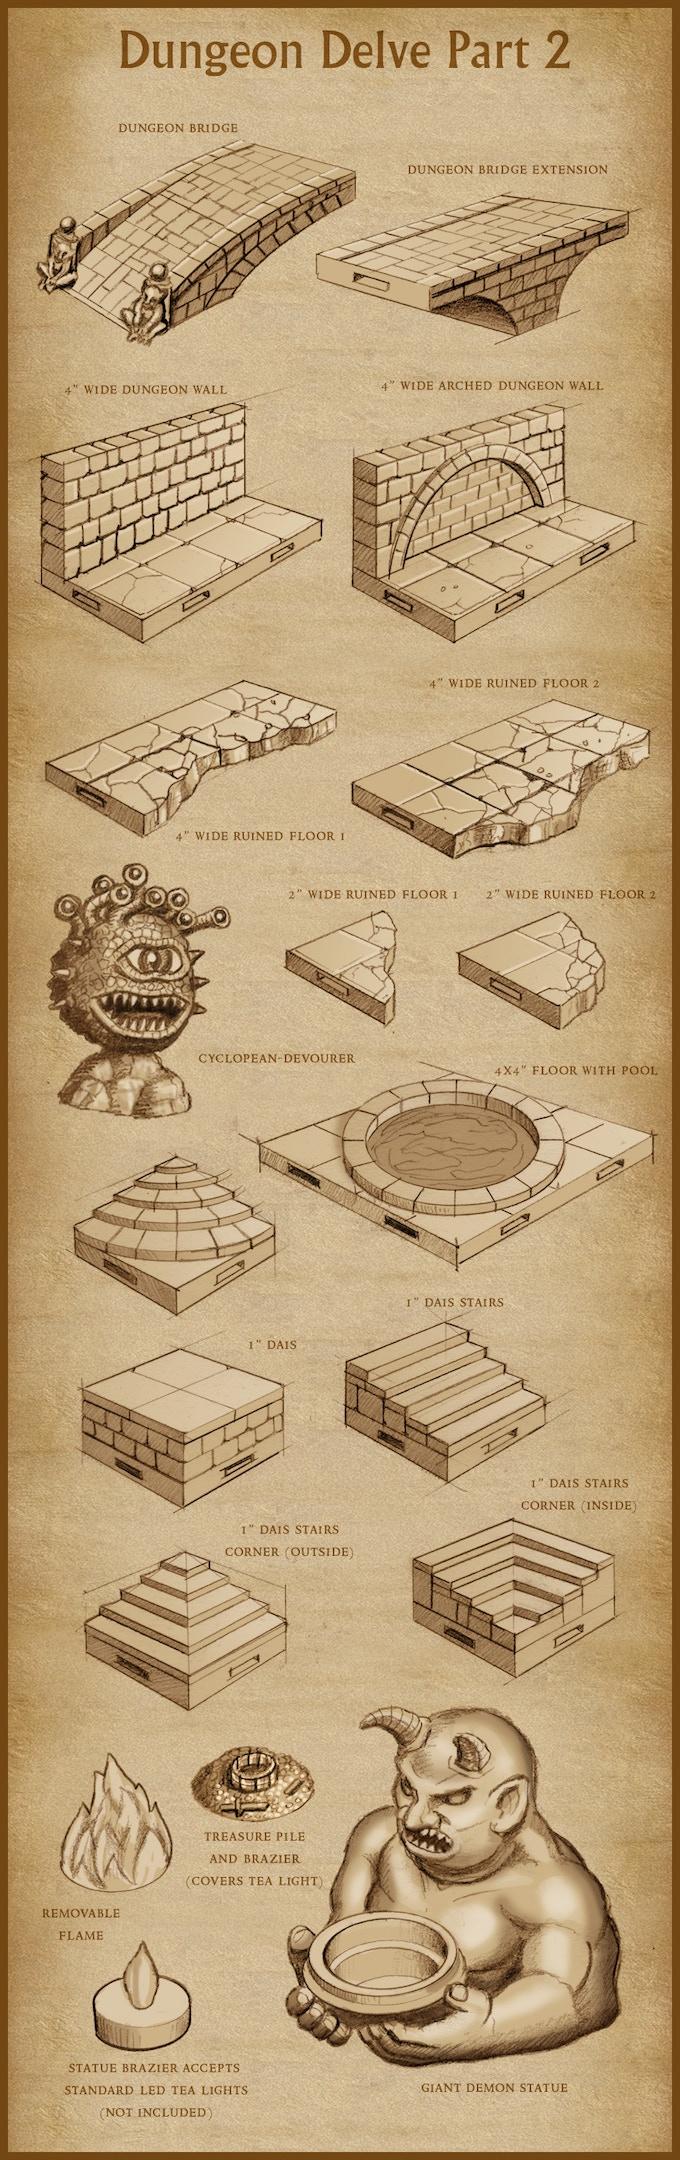 'Dungeon Delve Part 2' pledge level (final design subject to change).